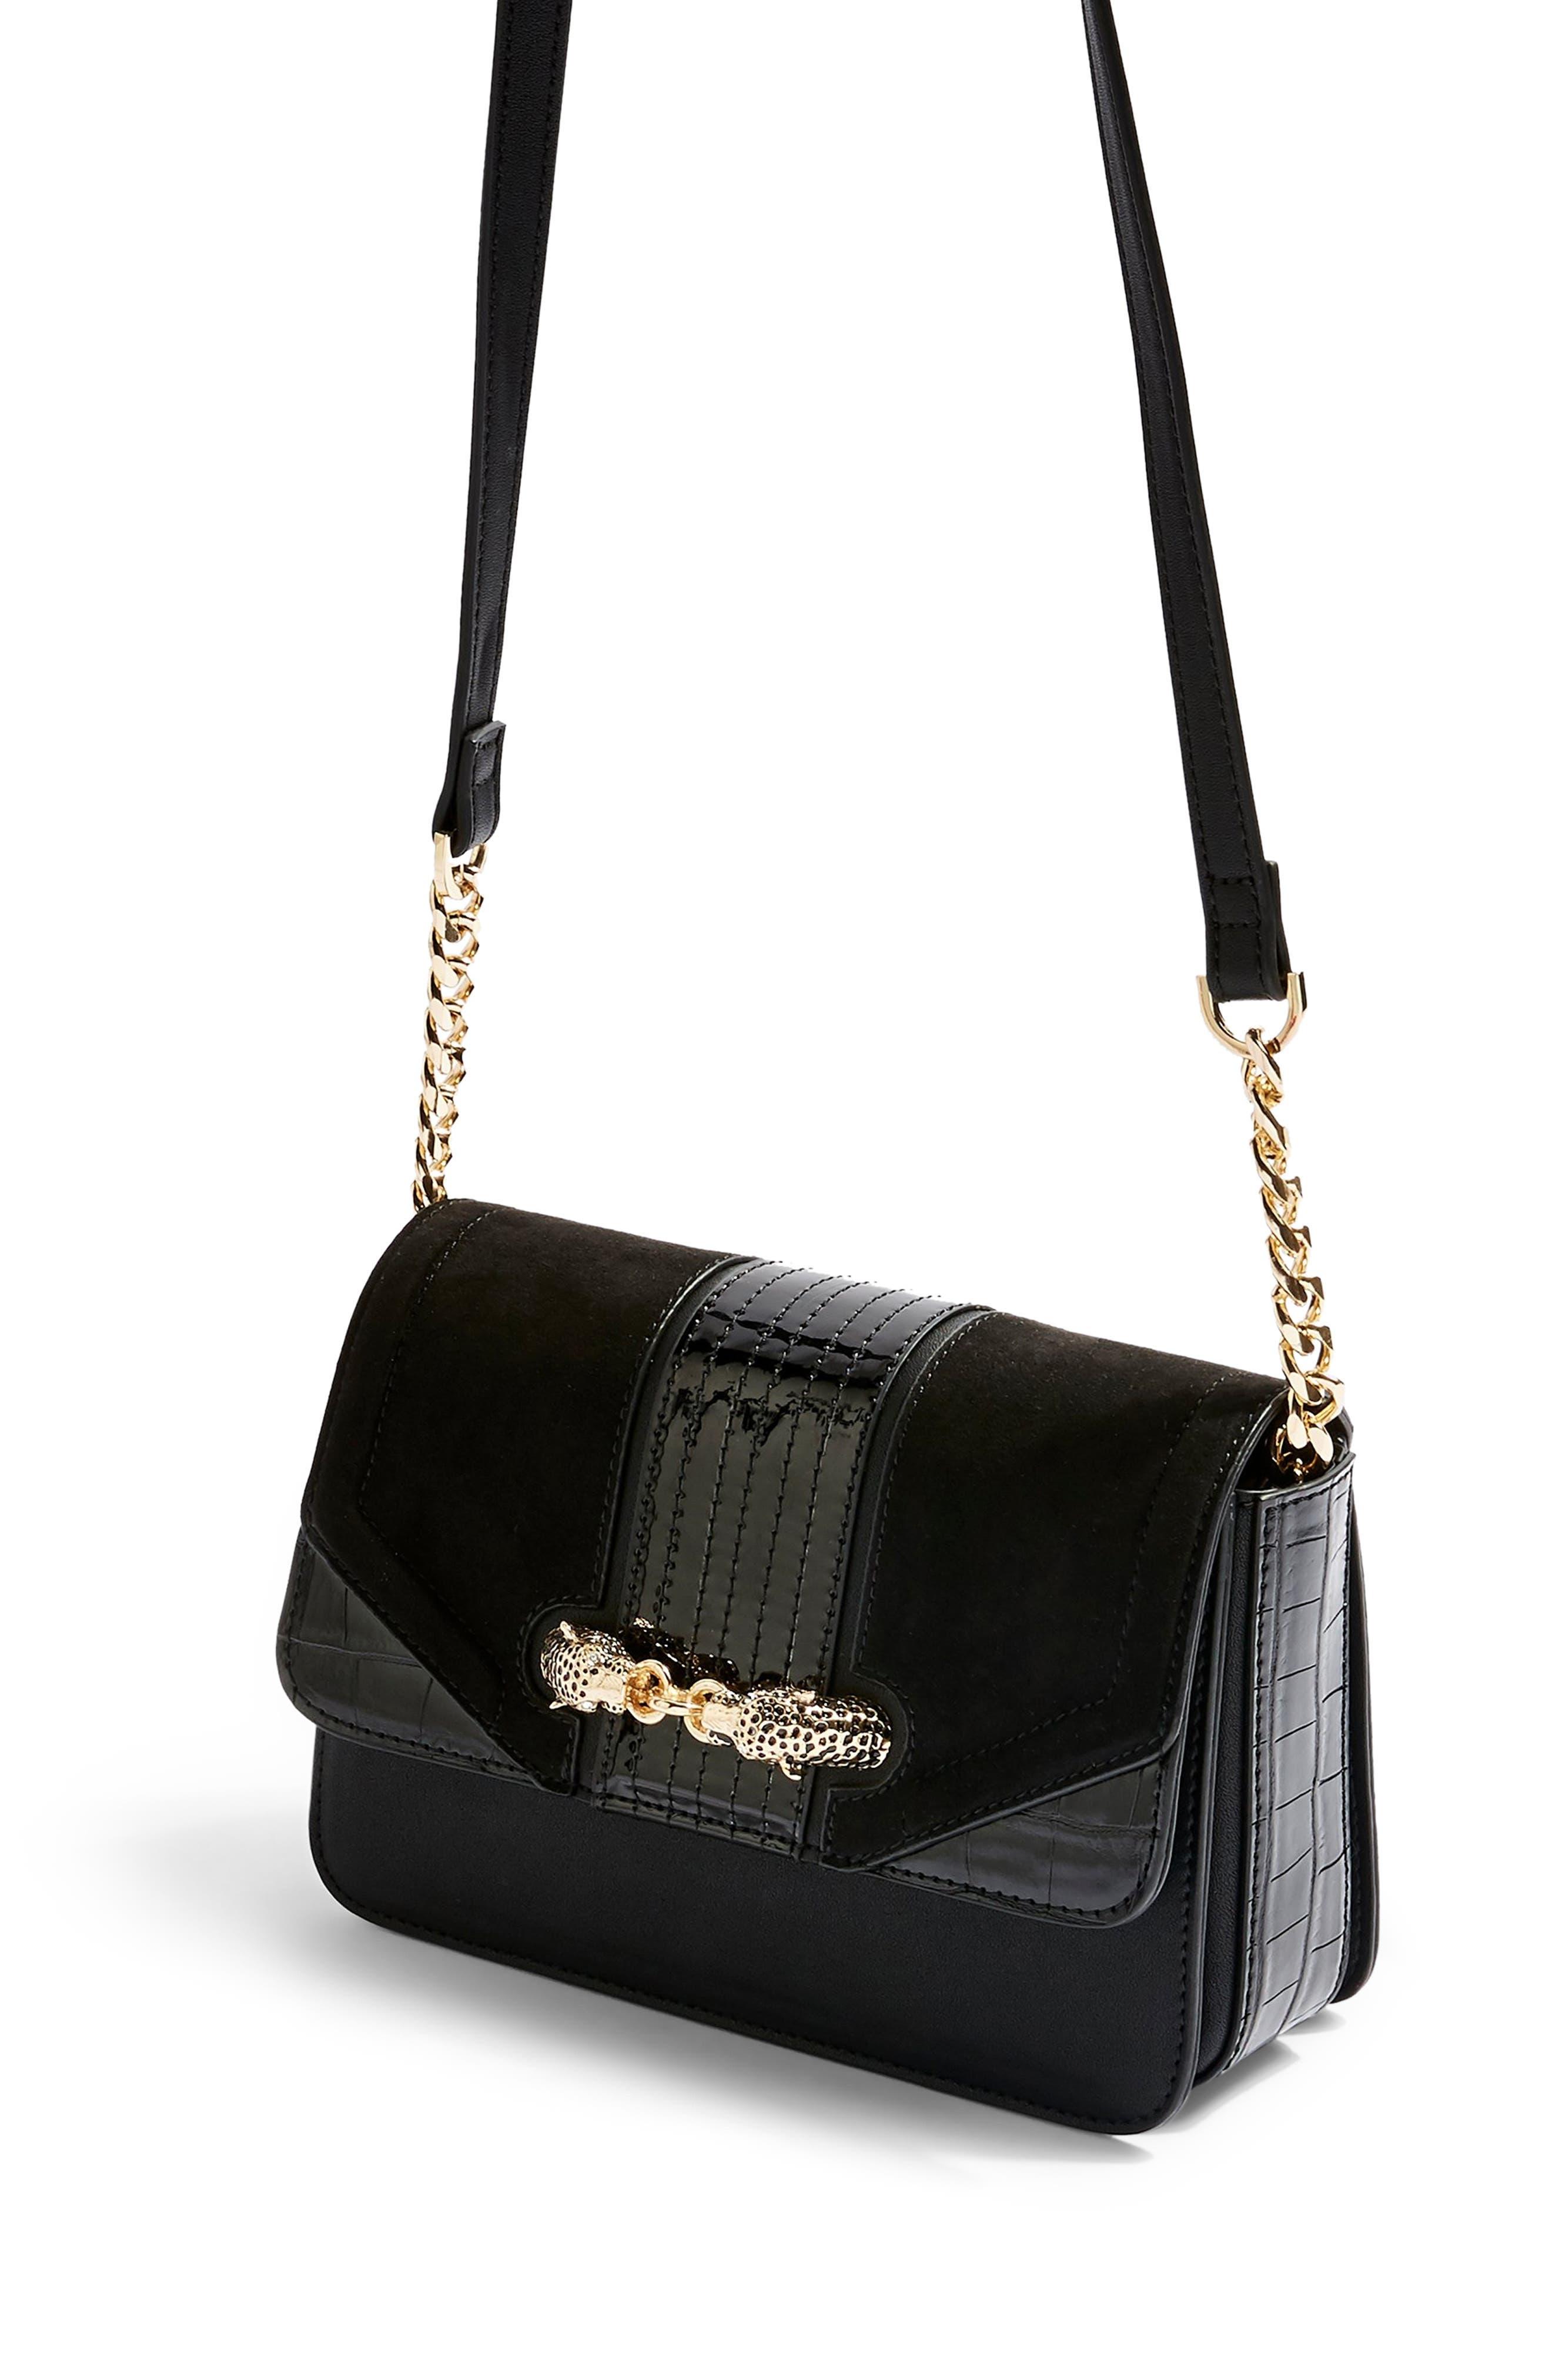 TOPSHOP, Cheetah Crossbody Bag, Alternate thumbnail 4, color, BLACK MULTI